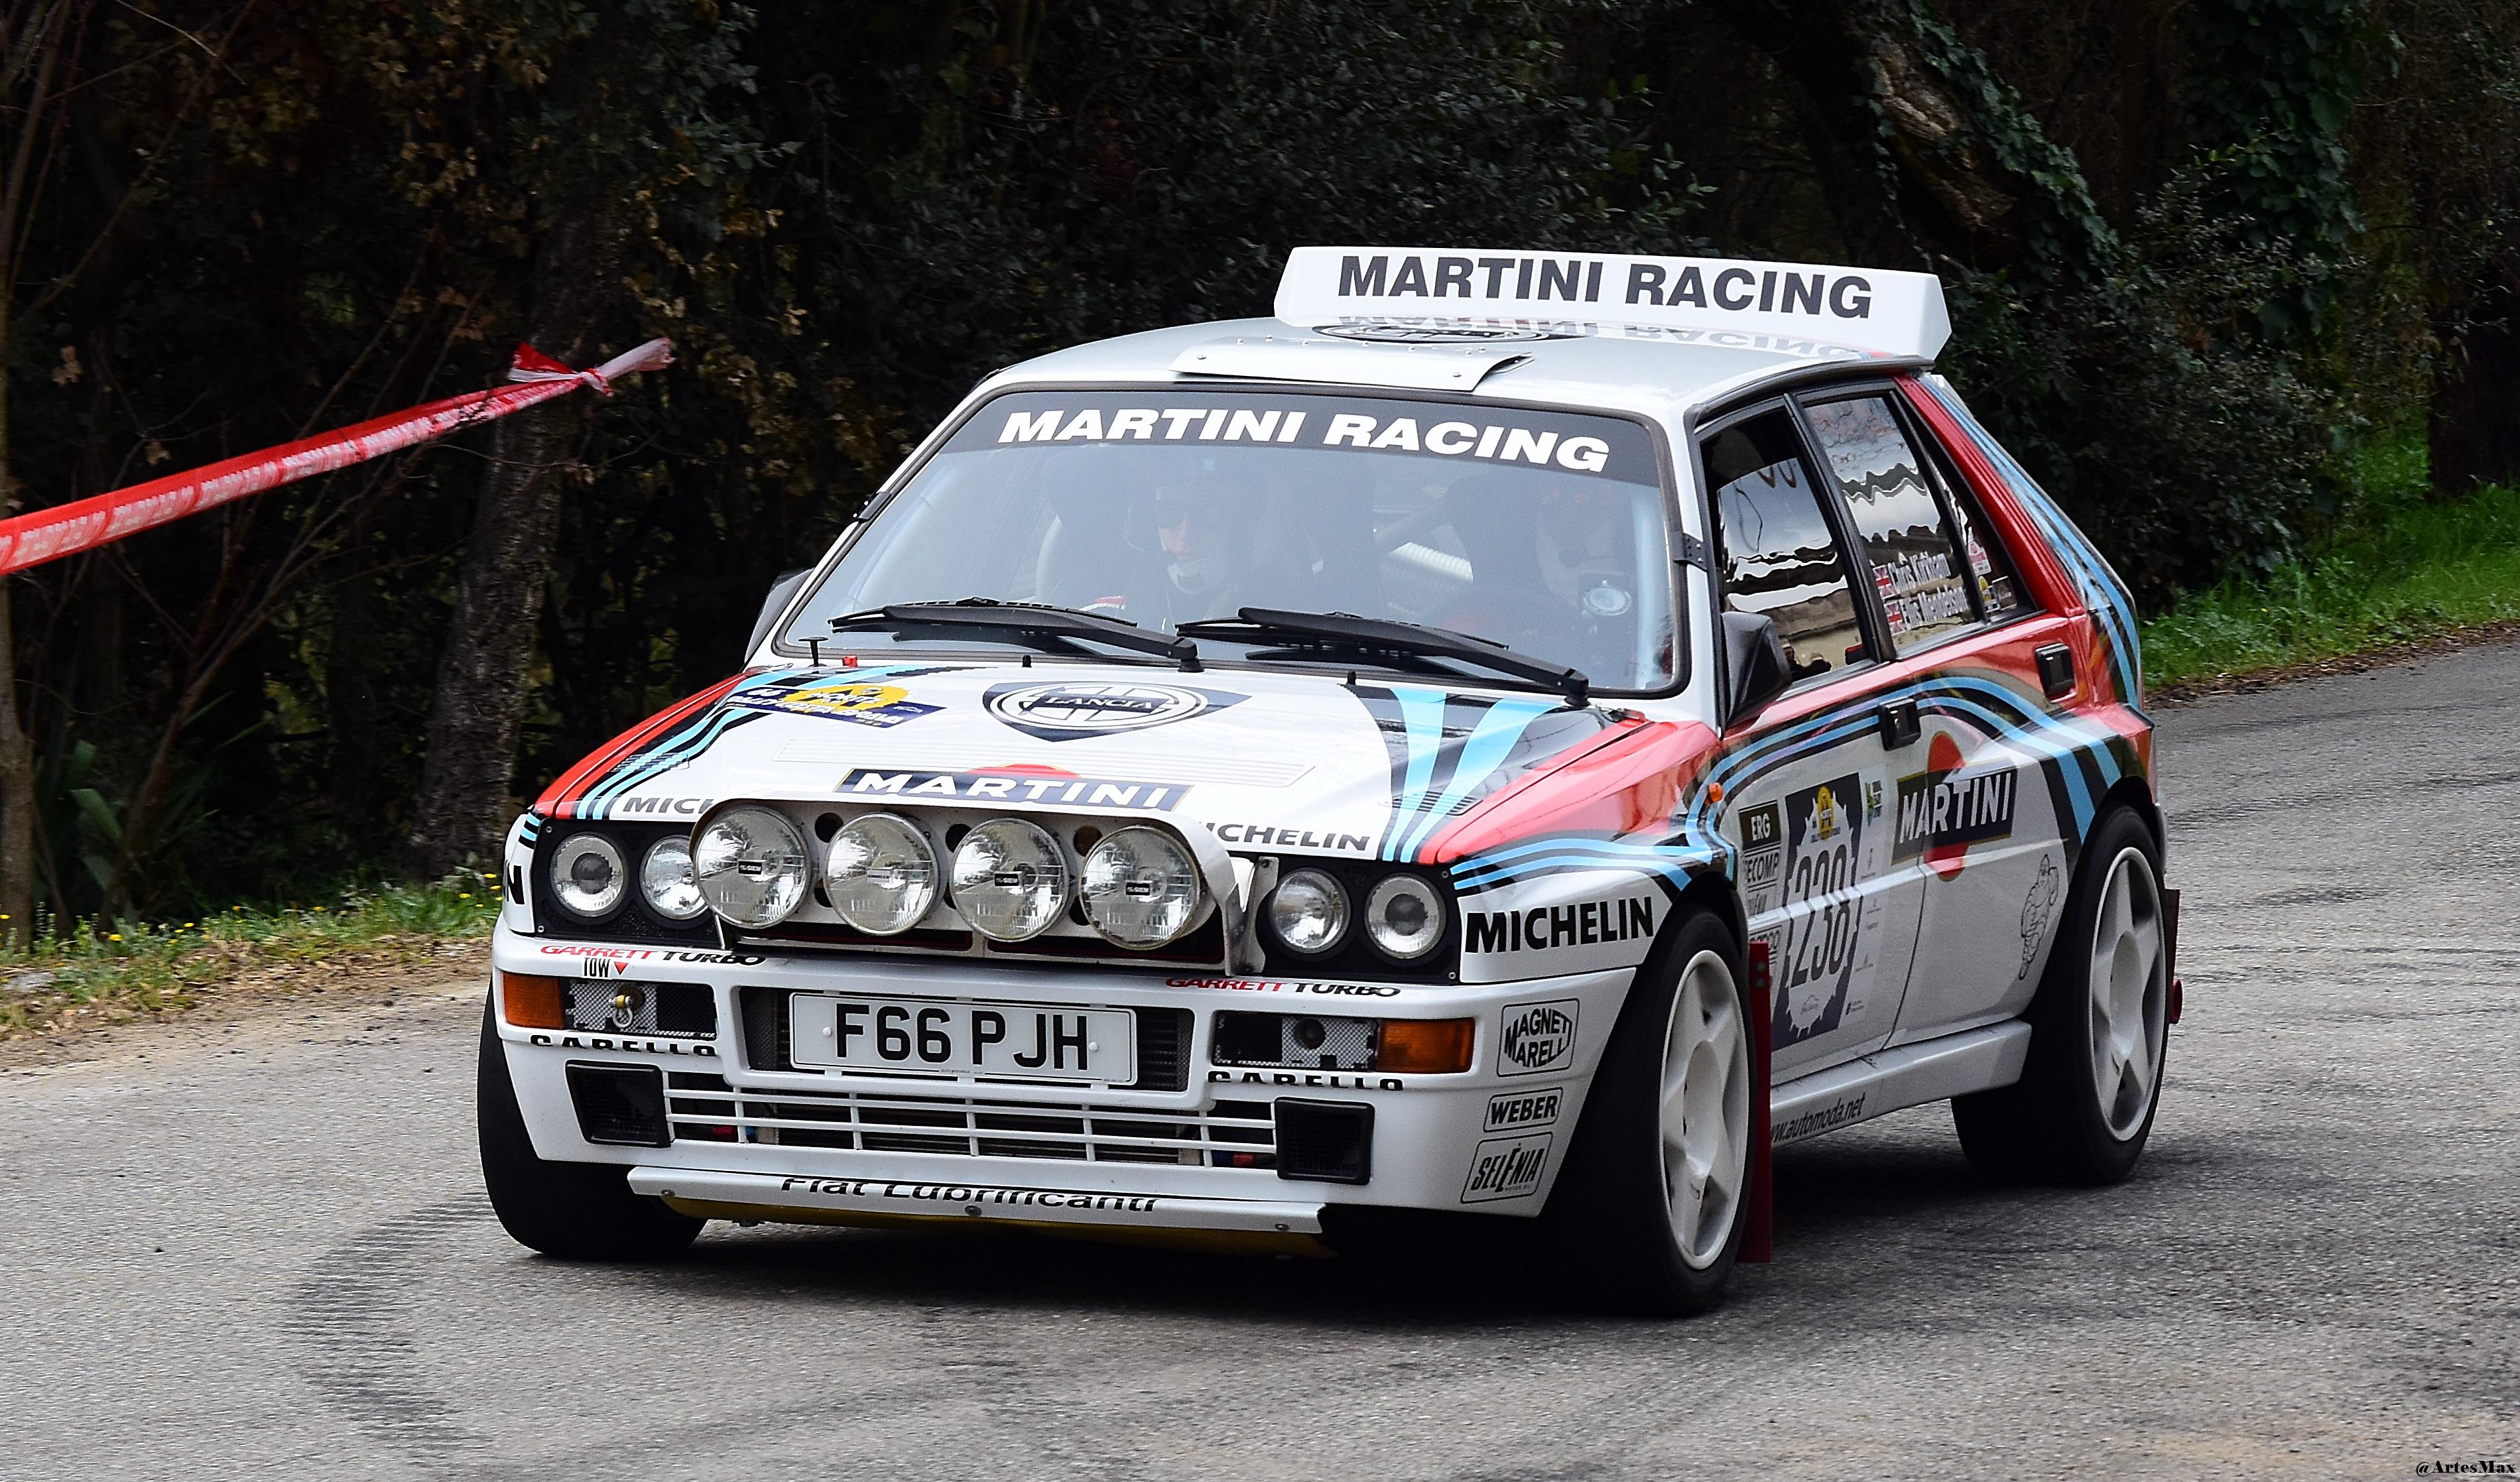 Lancia_Delta_Integrale_HF_16V_Rally_Mori